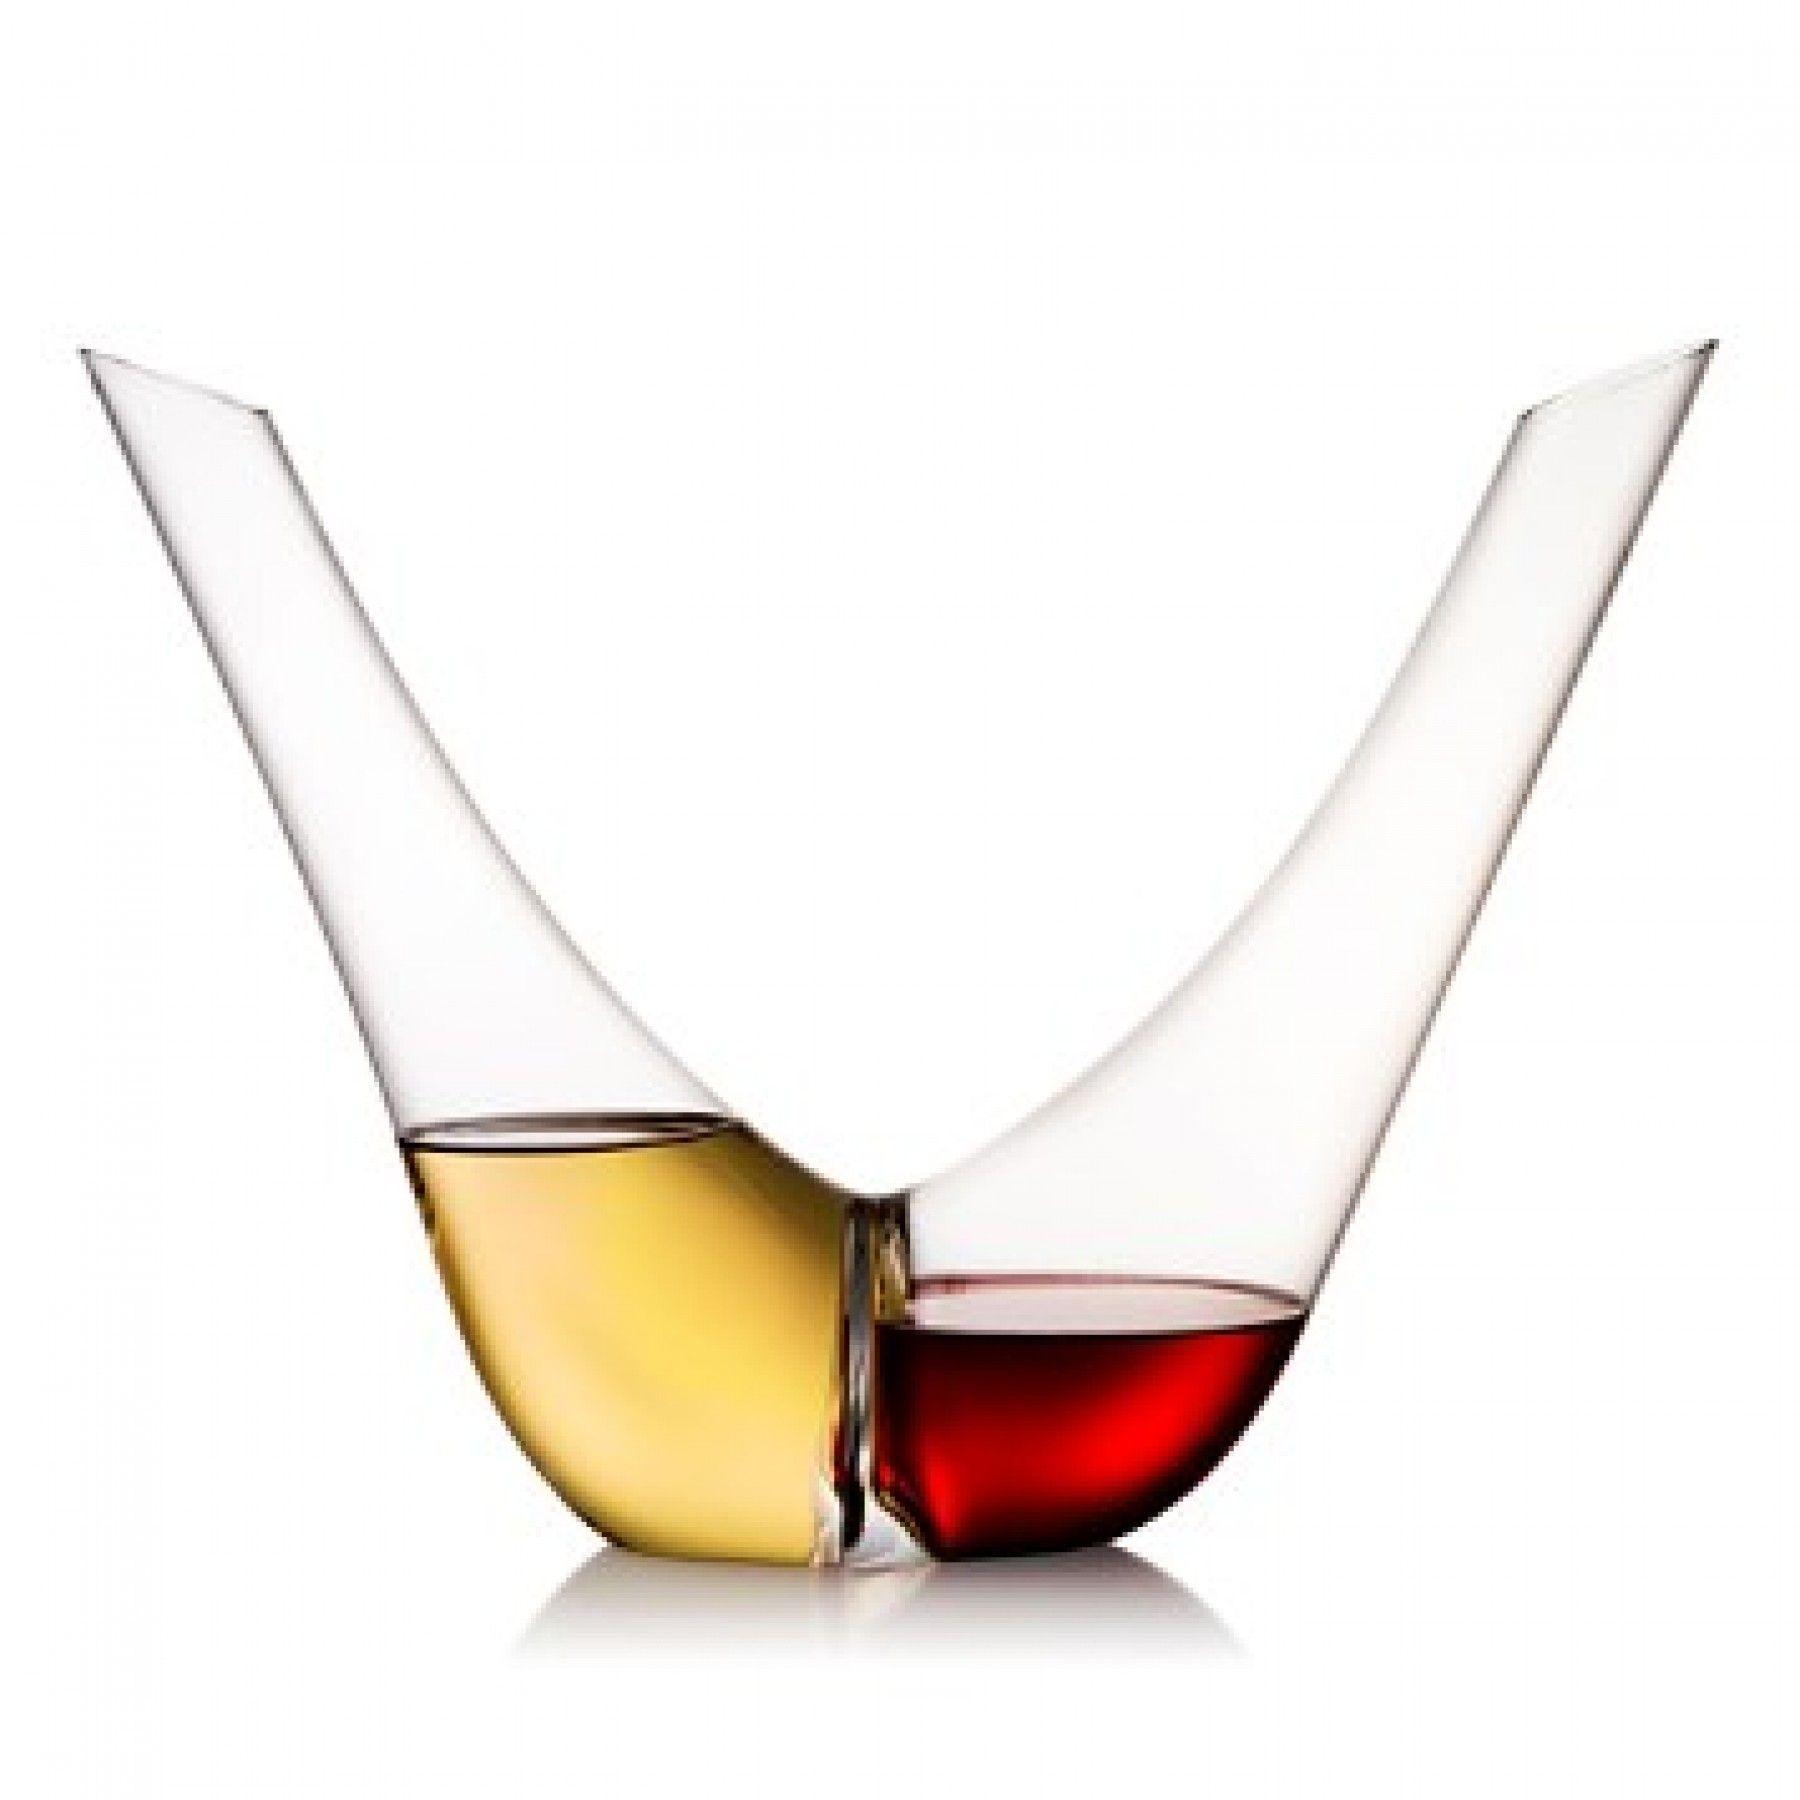 Modern Red Wine Decanter